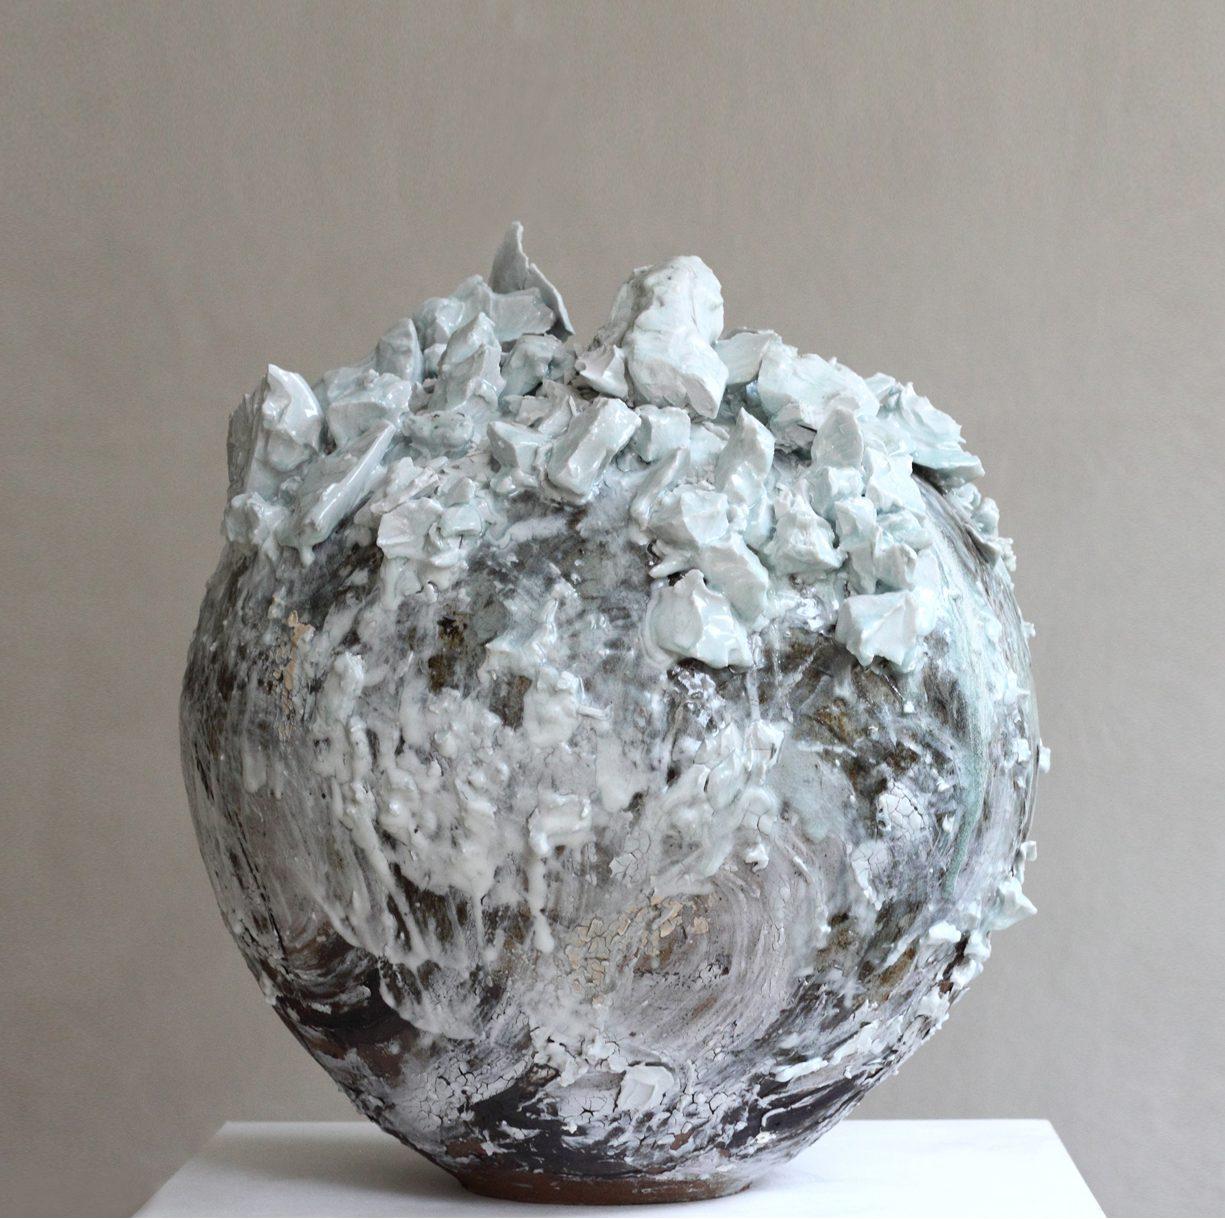 Extra Large Moon Jar, Akiko Hirai, 2020. Ceramics, 2020. Courtesy of Beaux Arts Bath